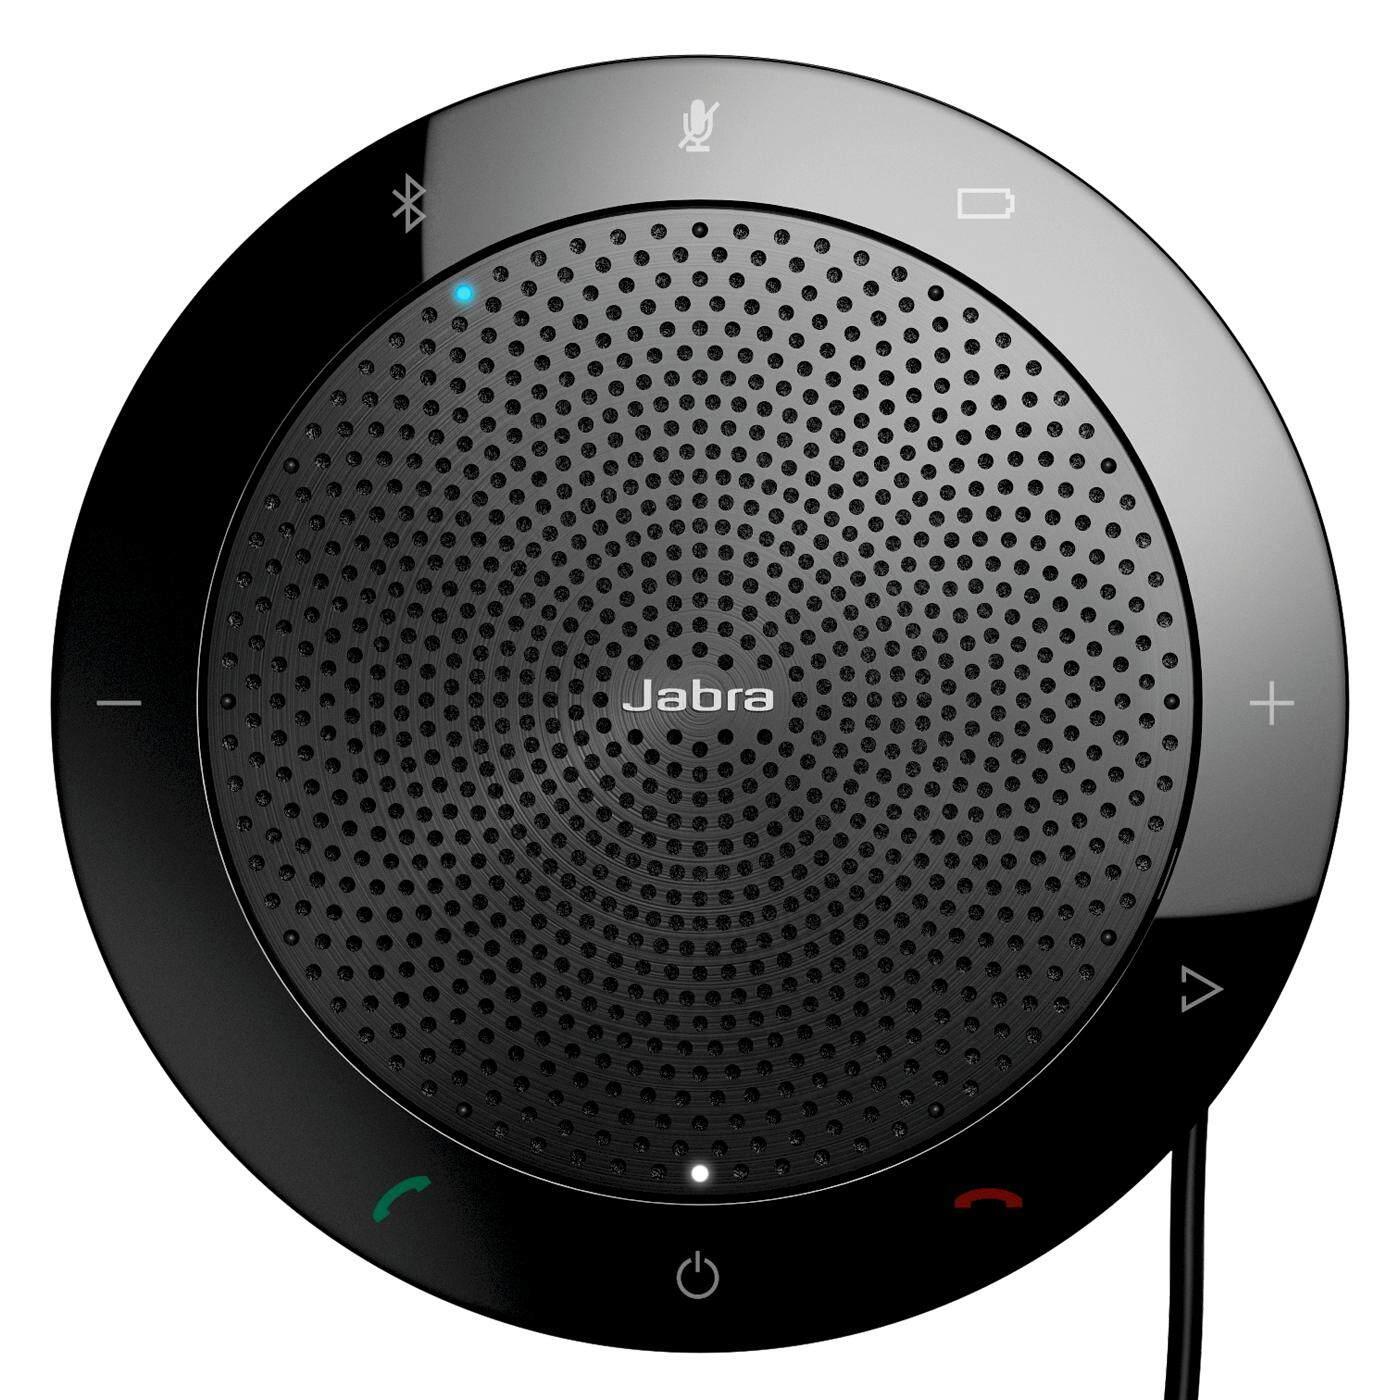 Jabra Speak 510 MS Portable USB and Wireless Bluetooth Conference Speakerphone